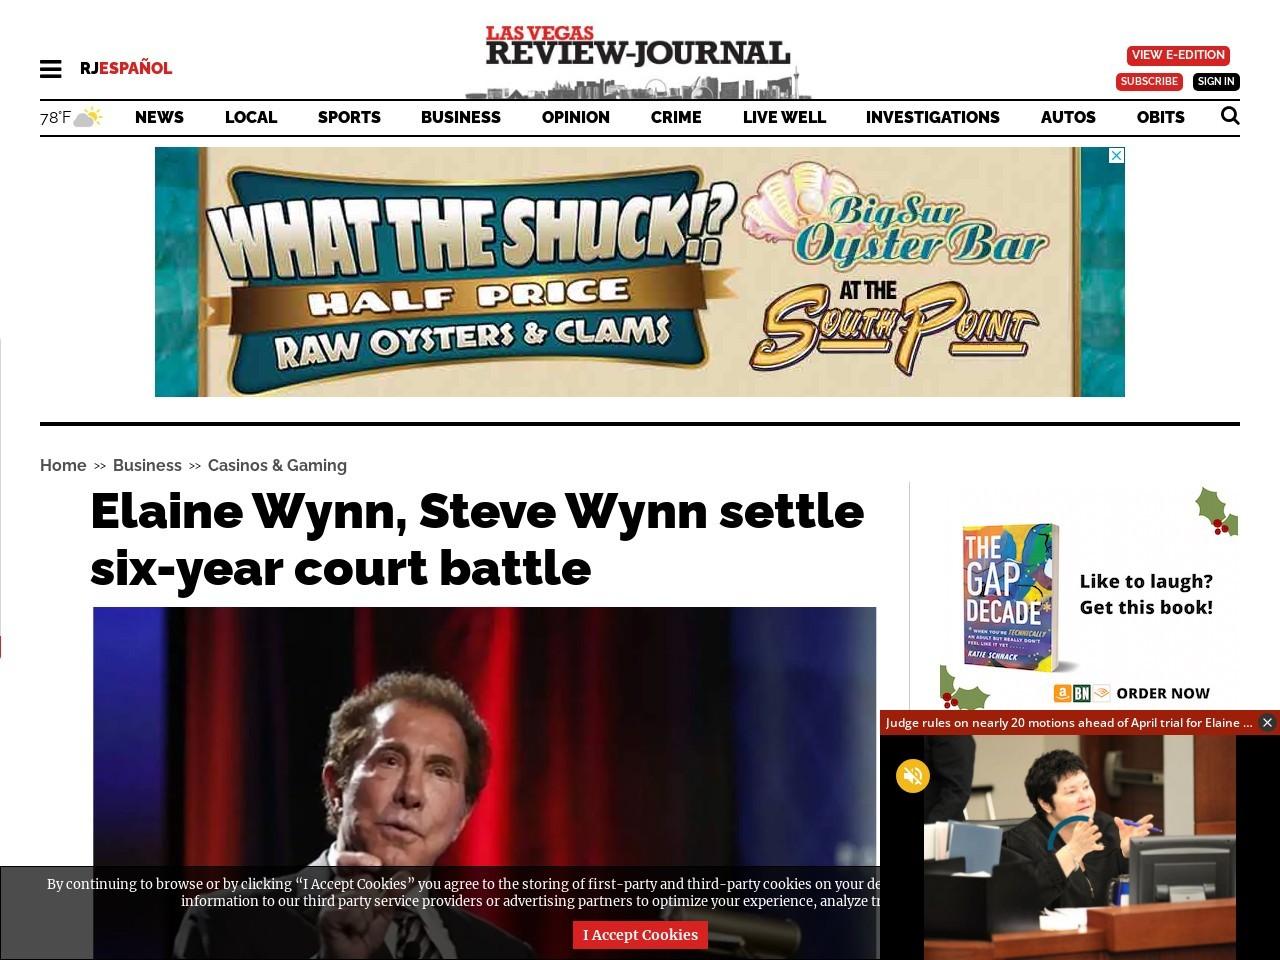 Elaine Wynn, Steve Wynn settle six-year court battle